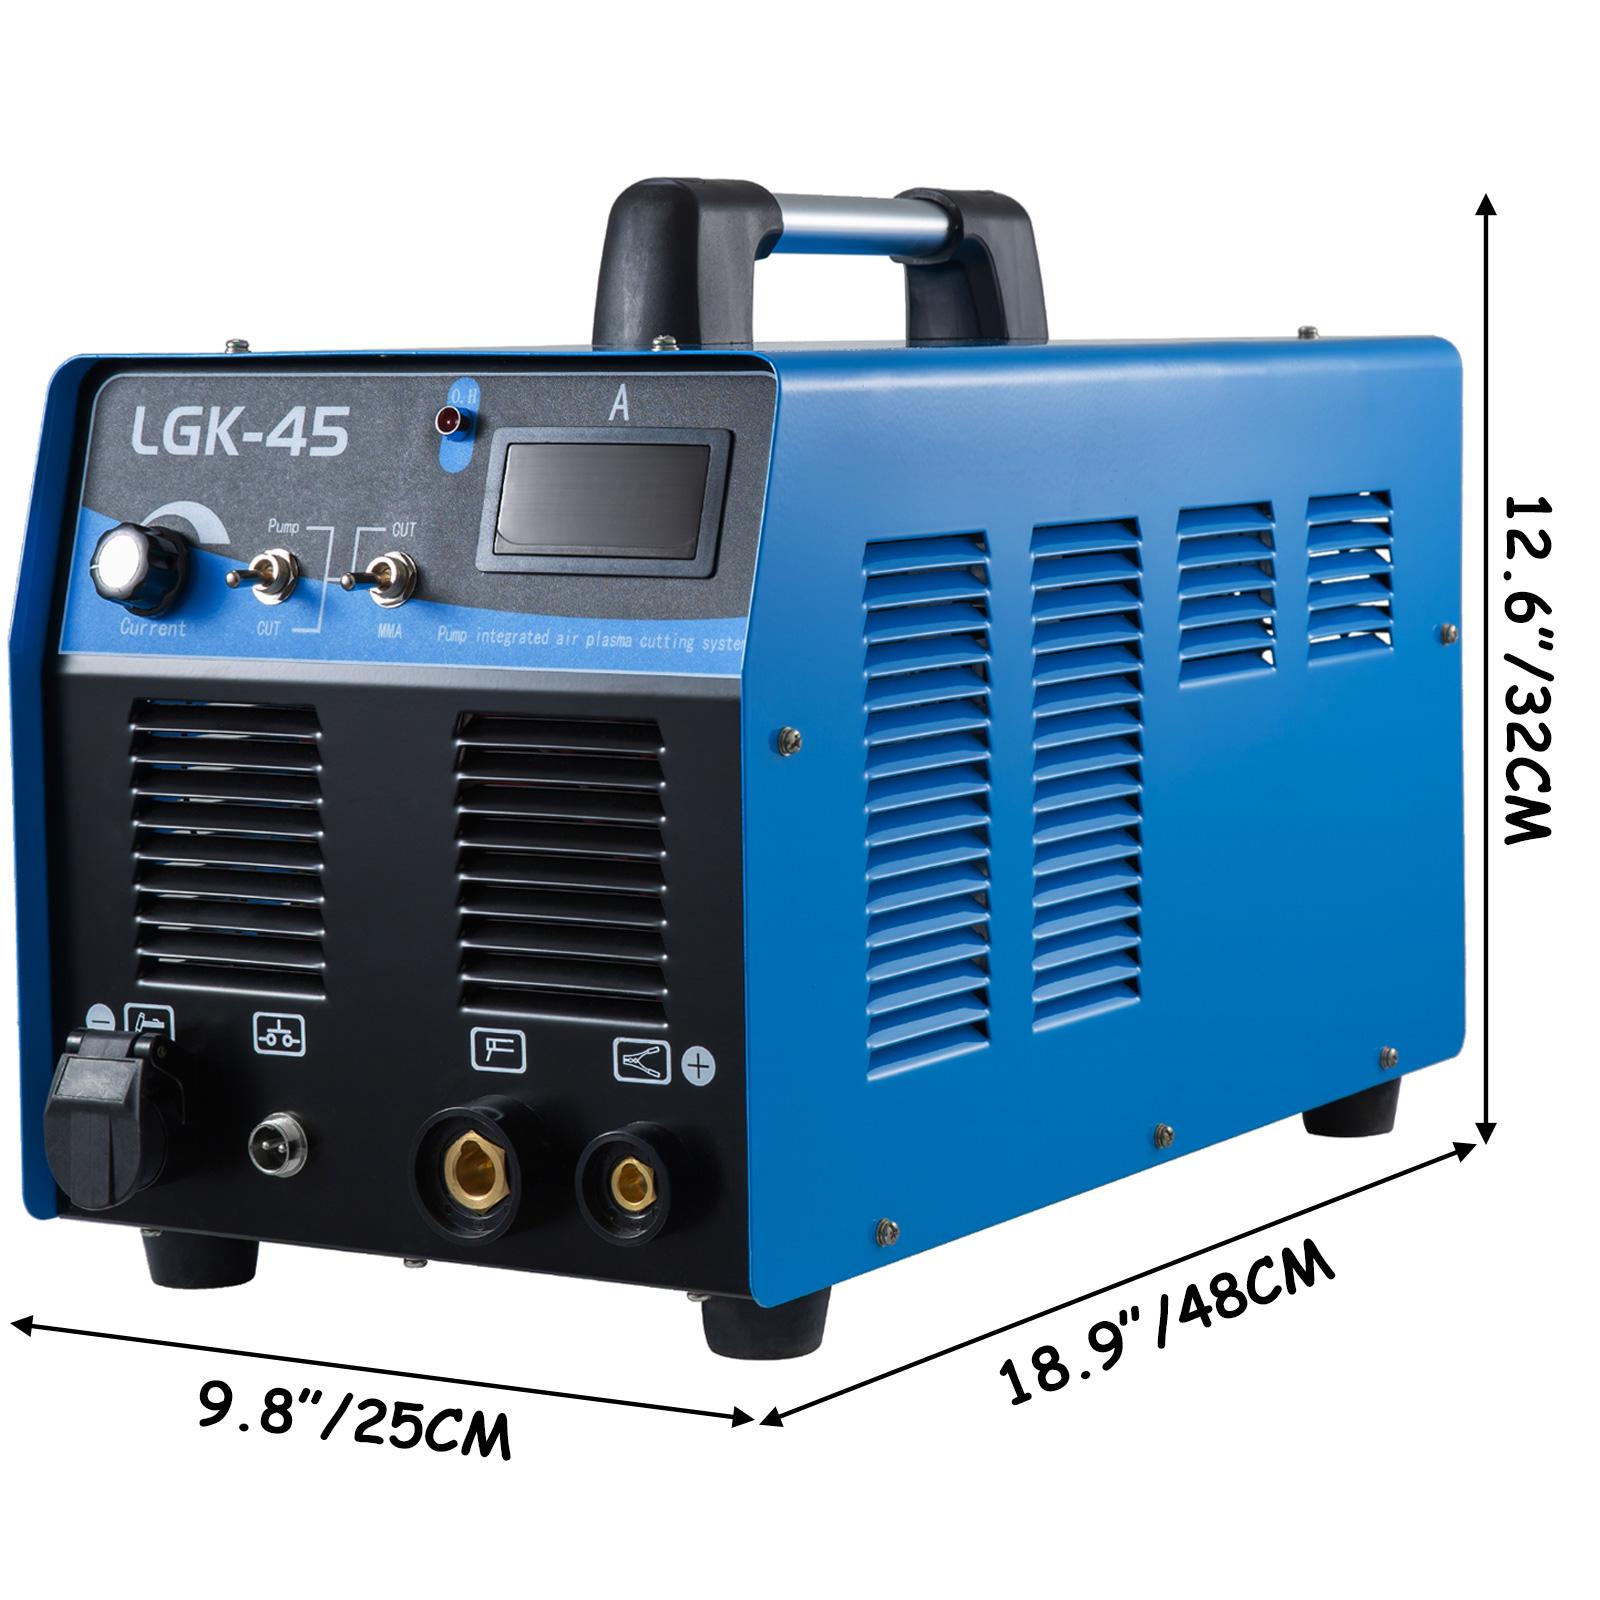 40-85A-Plasma-Cutter-Built-In-Air-Compressor-Inverter-Cutting-Machine-Cut-35mm thumbnail 32